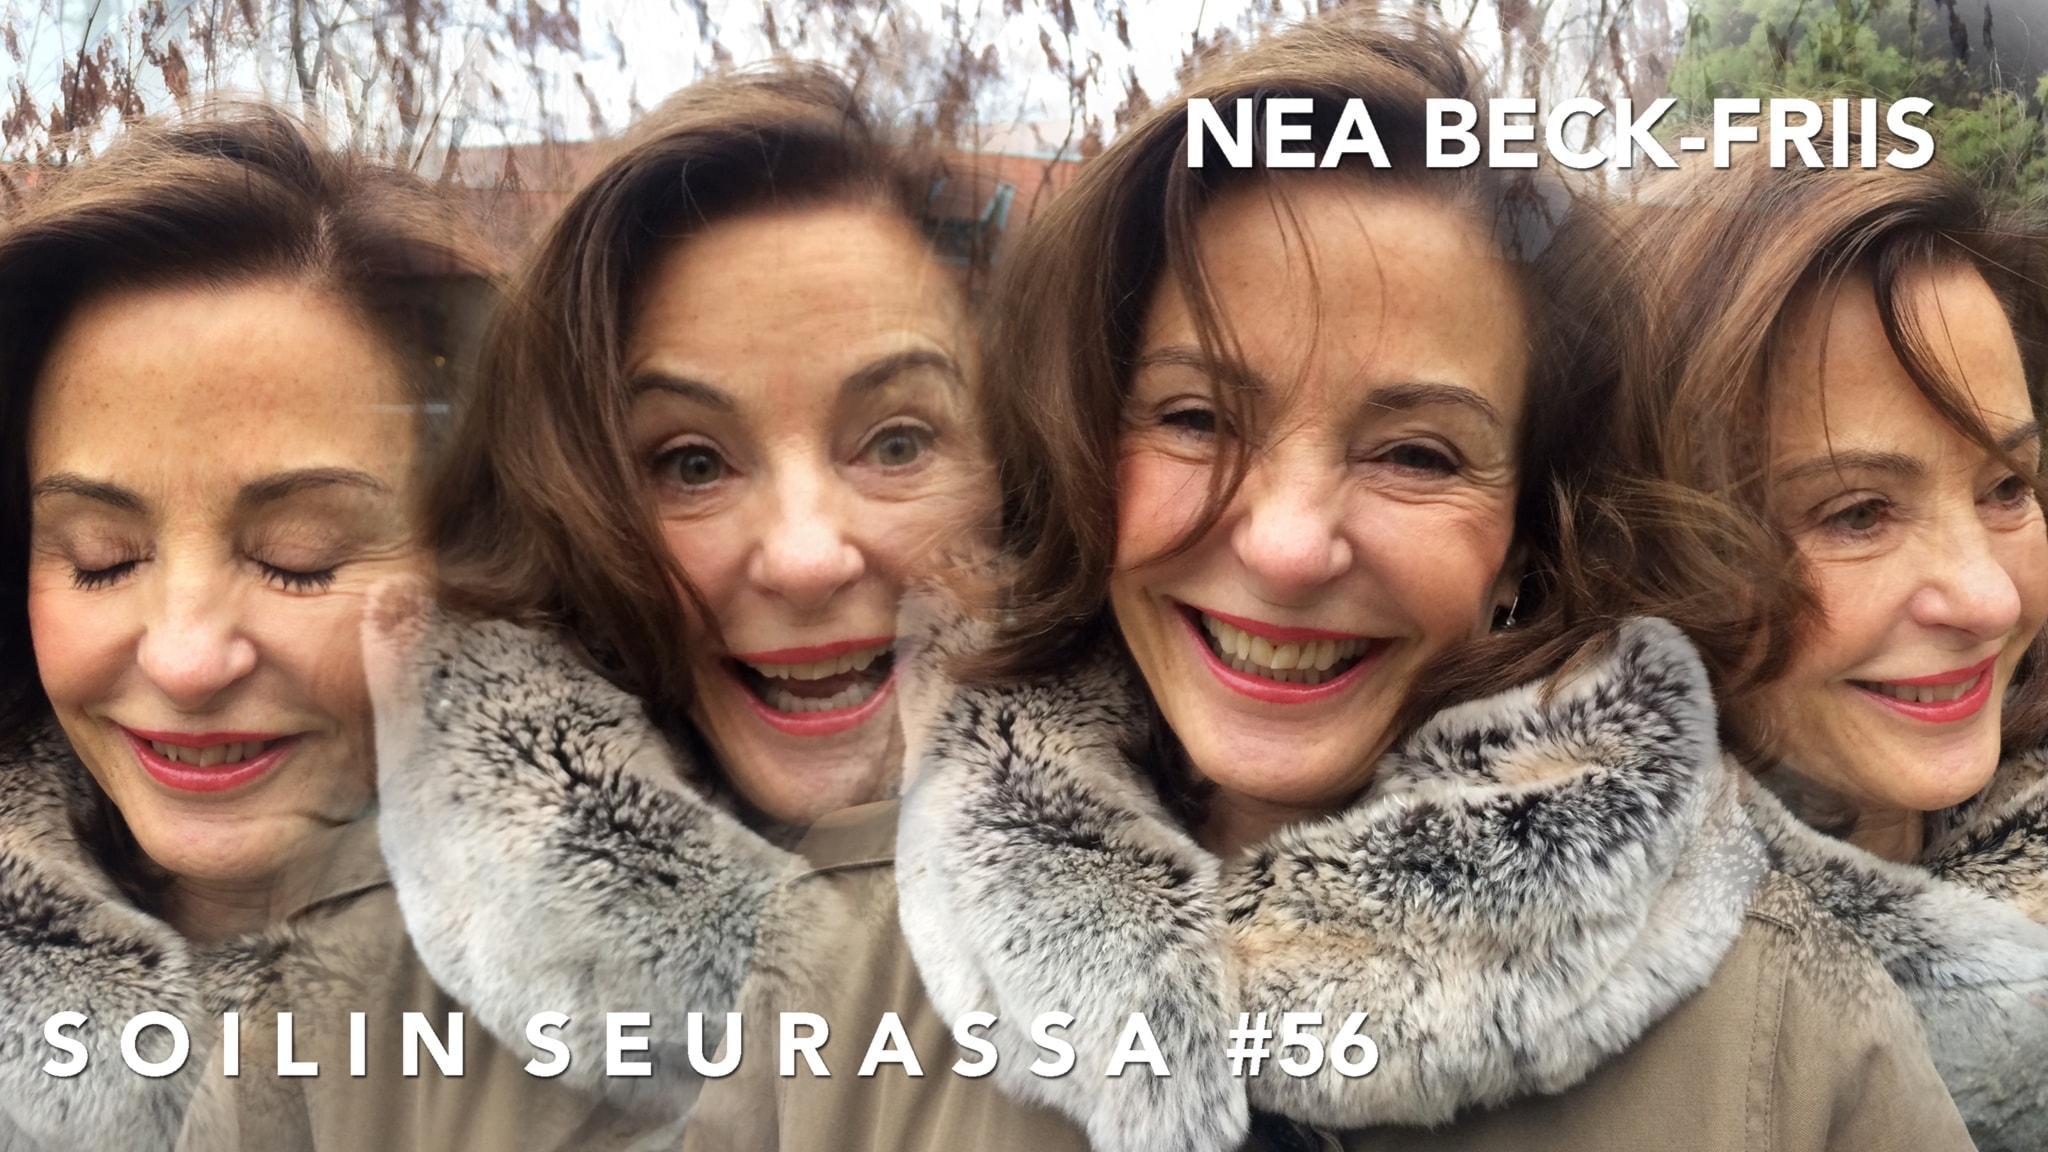 Soilin seurassa vapaaherratar Nea Beck-Friis